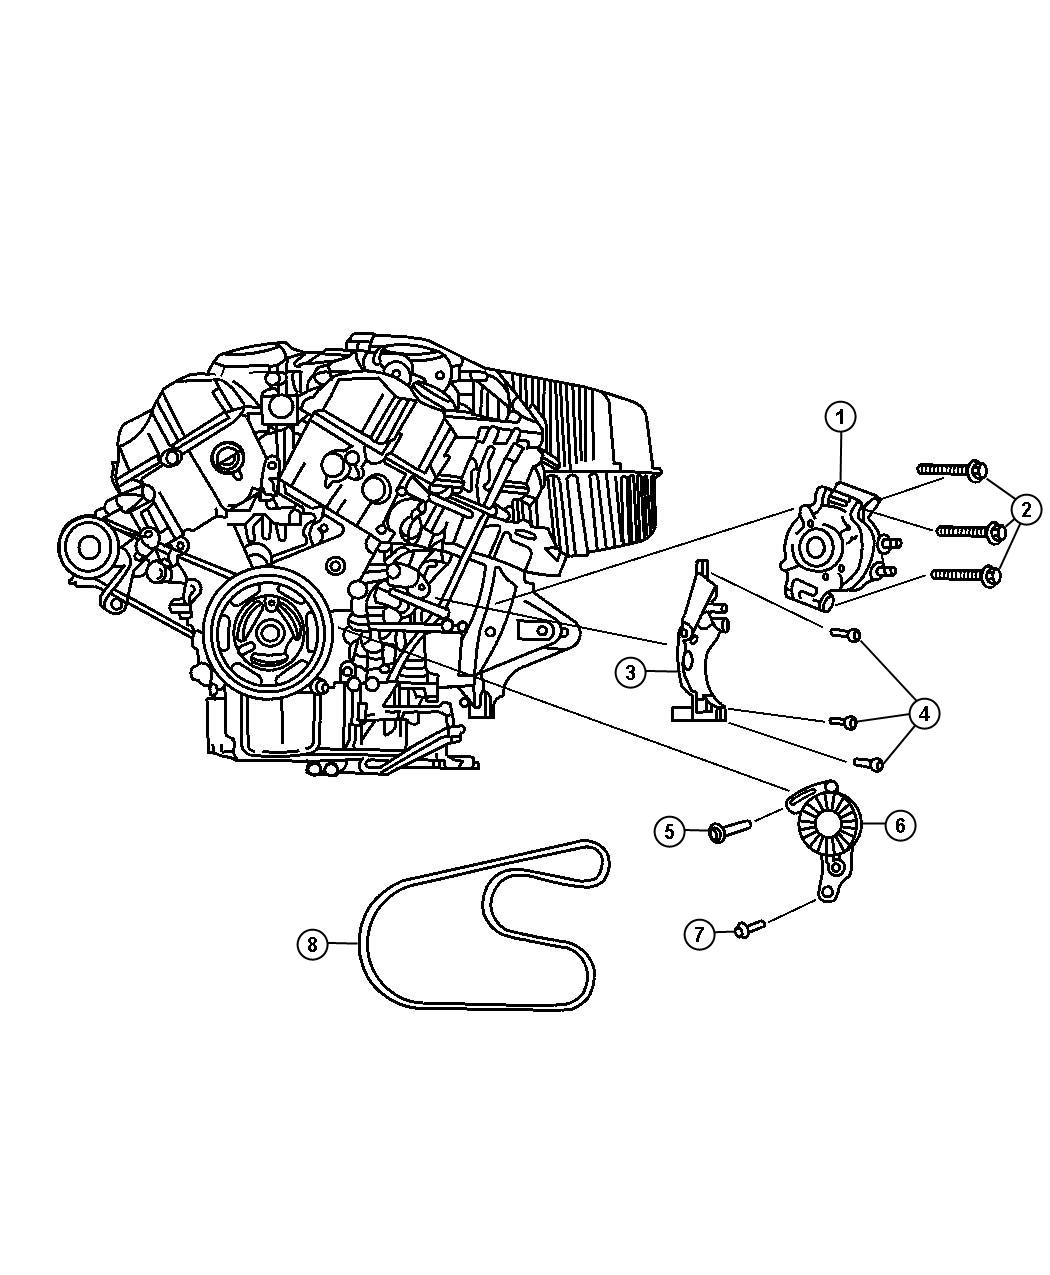 Chrysler Sebring Convertible Lxi 2 7l V6 A T Belt